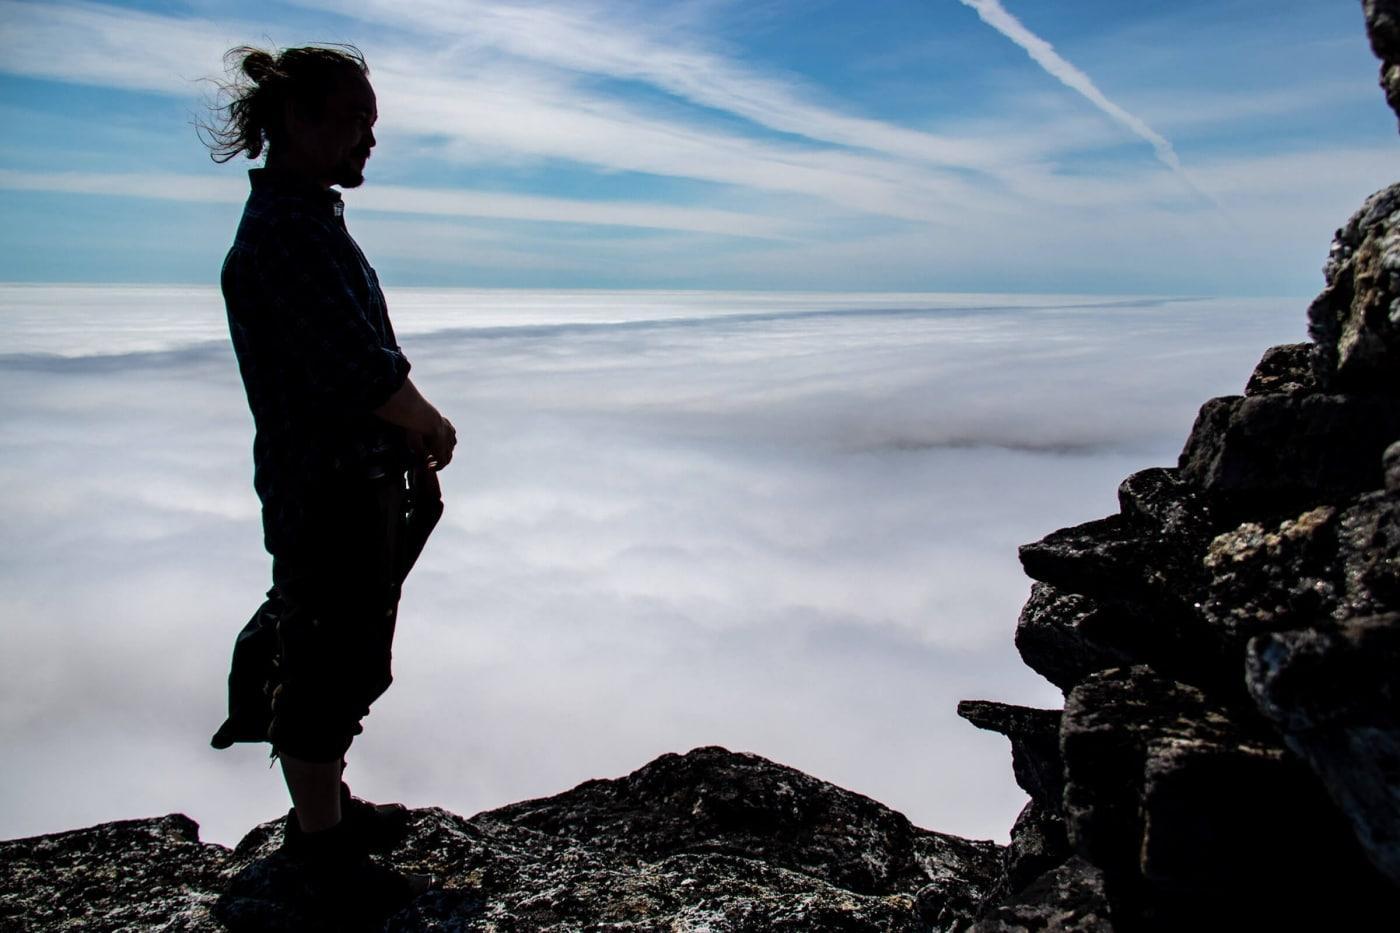 Local guide Salik Frederiksen looks over a Nanortalik shrouded in cloud. Photo by Iris Timmermans - Visit Greenland